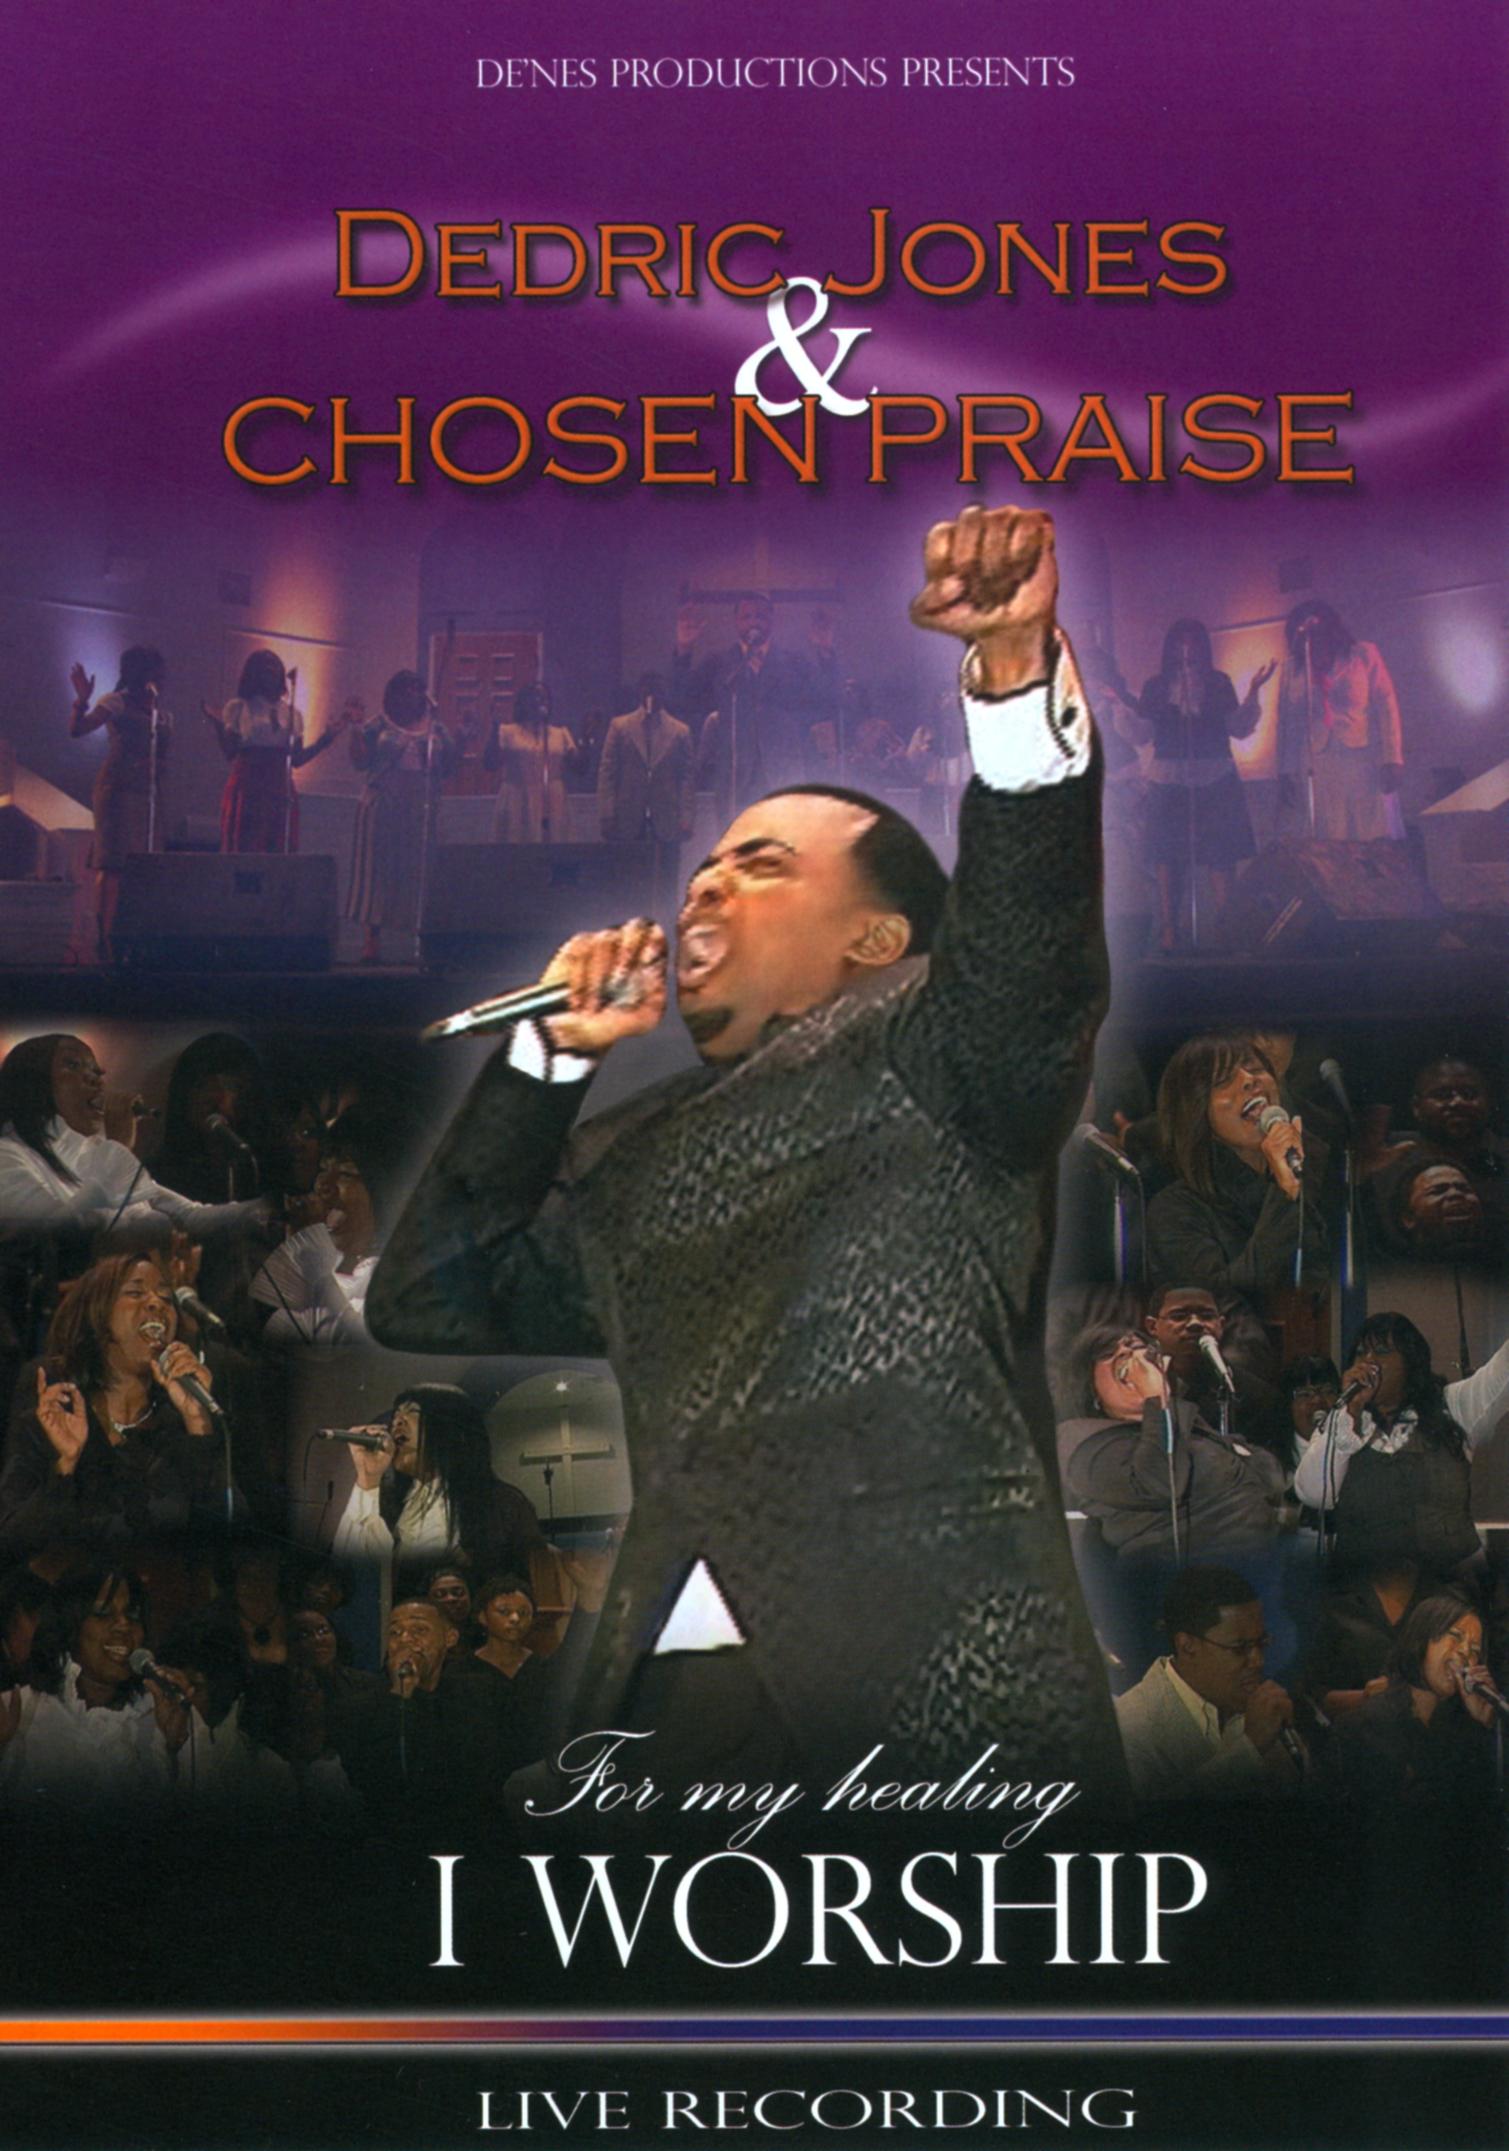 Dedric Jones & Chosen Praise: For My Healing I Worship